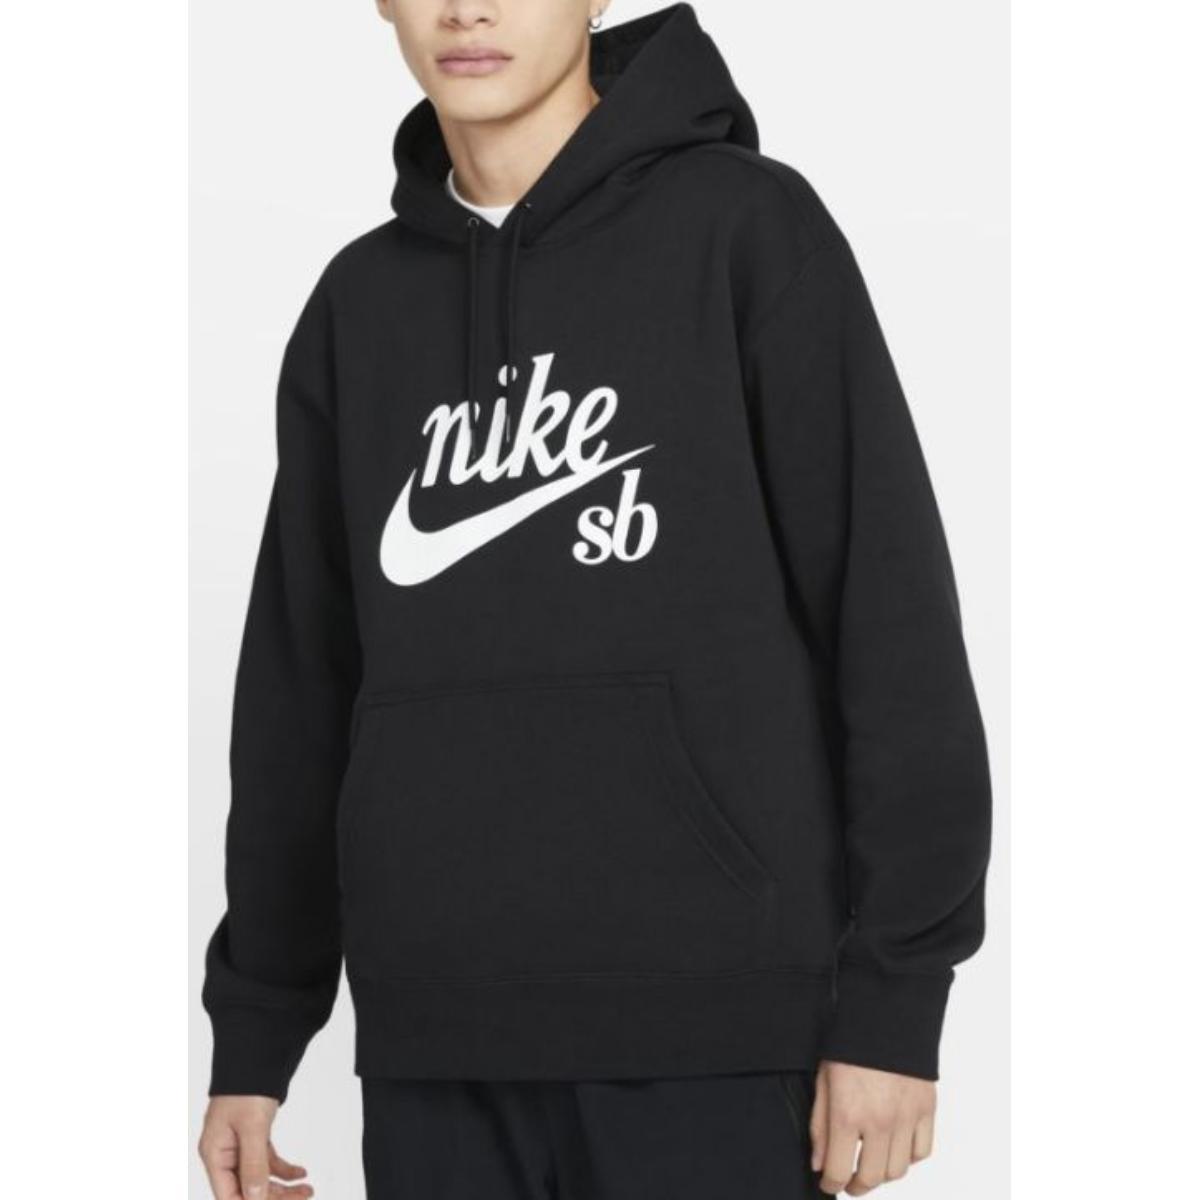 Blusão Masculino Nike Cw4383-010 sb Craft Hoodie Preto